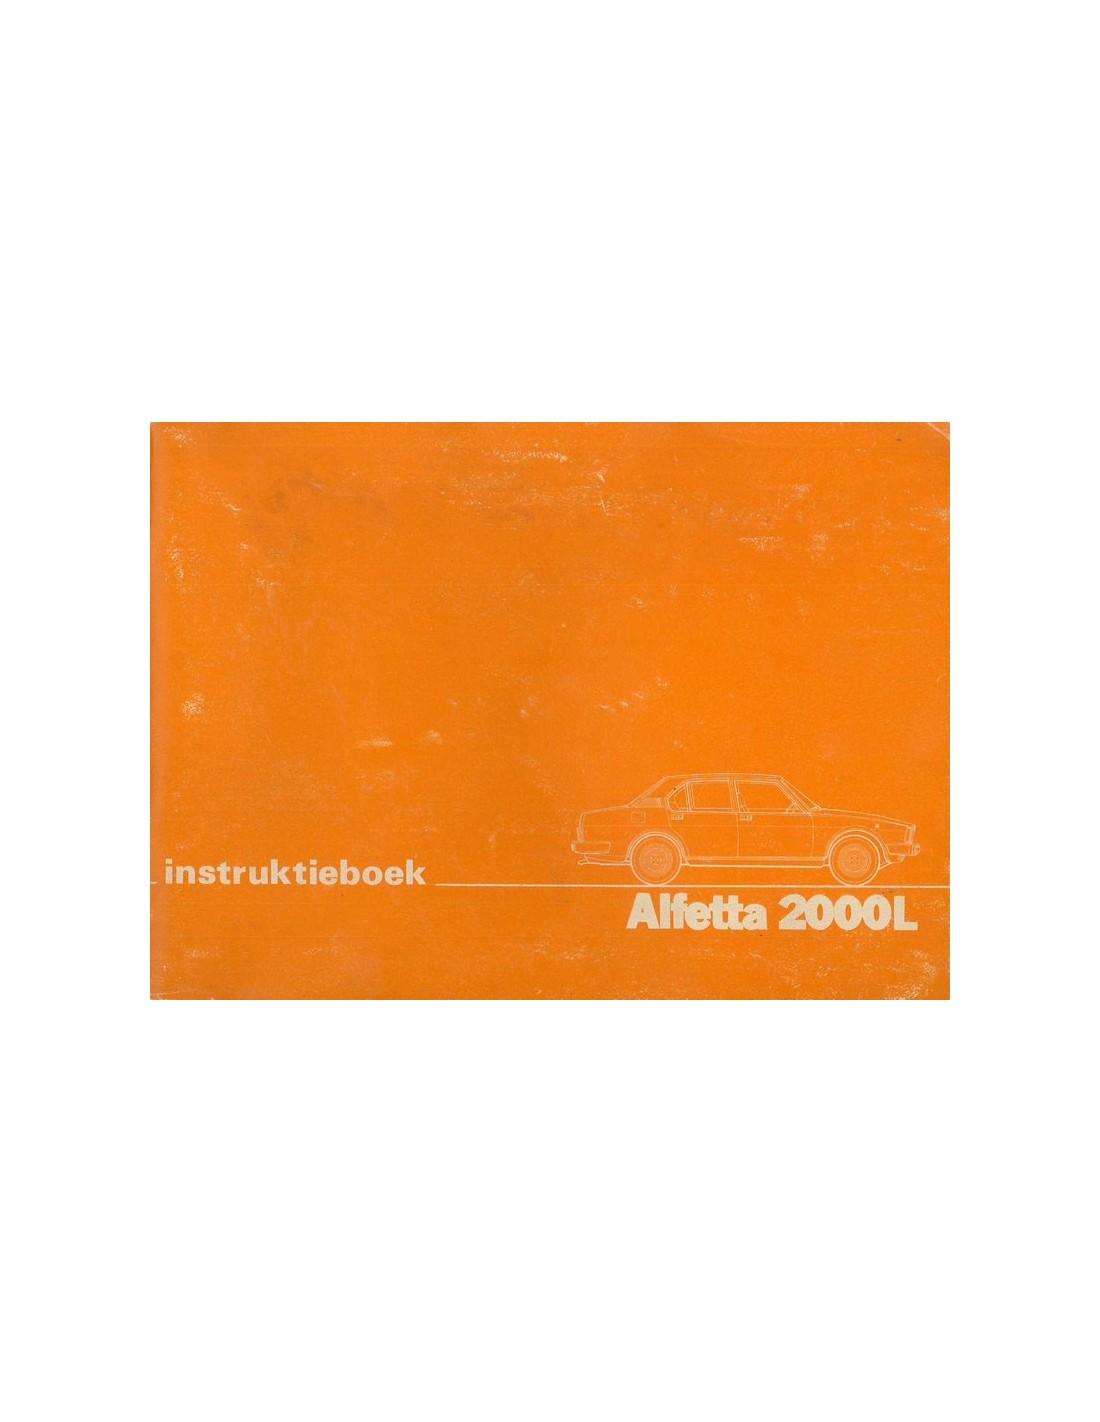 1979 ALFA ROMEO ALFETTA 2000L OWNERS MANUAL DUTCH